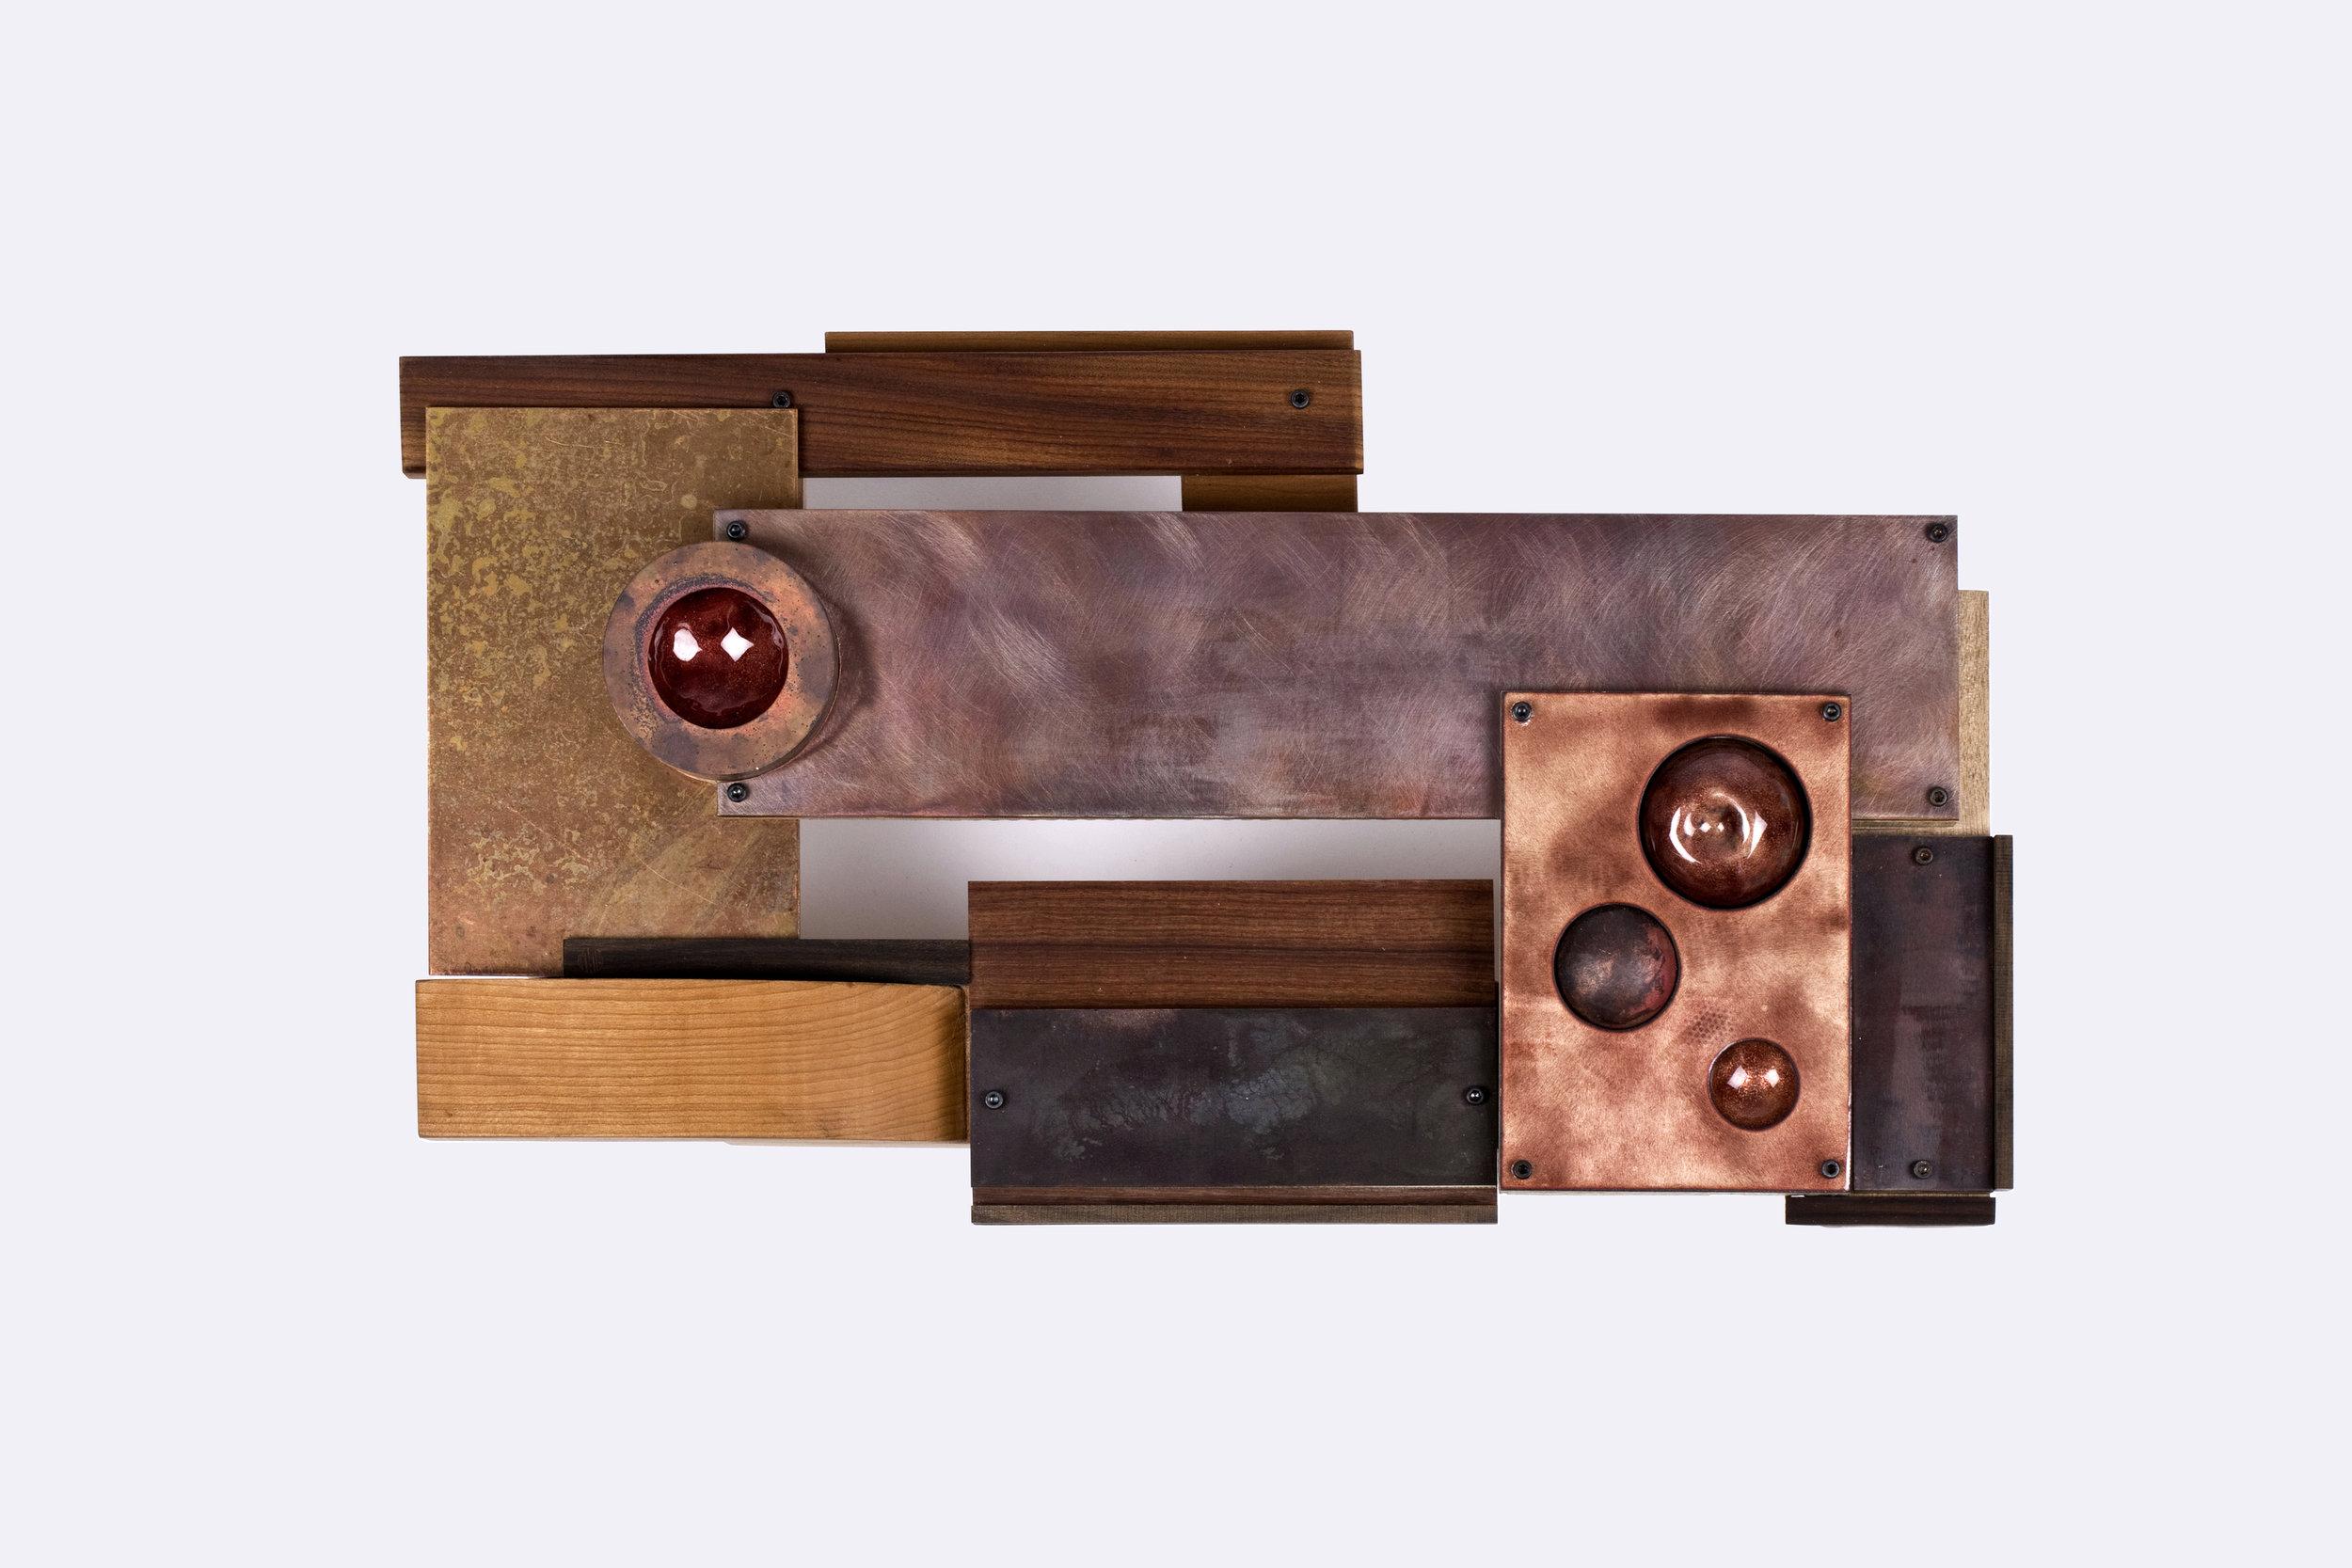 Med eller mot    Wall sculpture, 2018   25x46x8cm   Materials: Wood, copper, brass, steel, enamel.  Photo credit: Aliona Pazdniakova